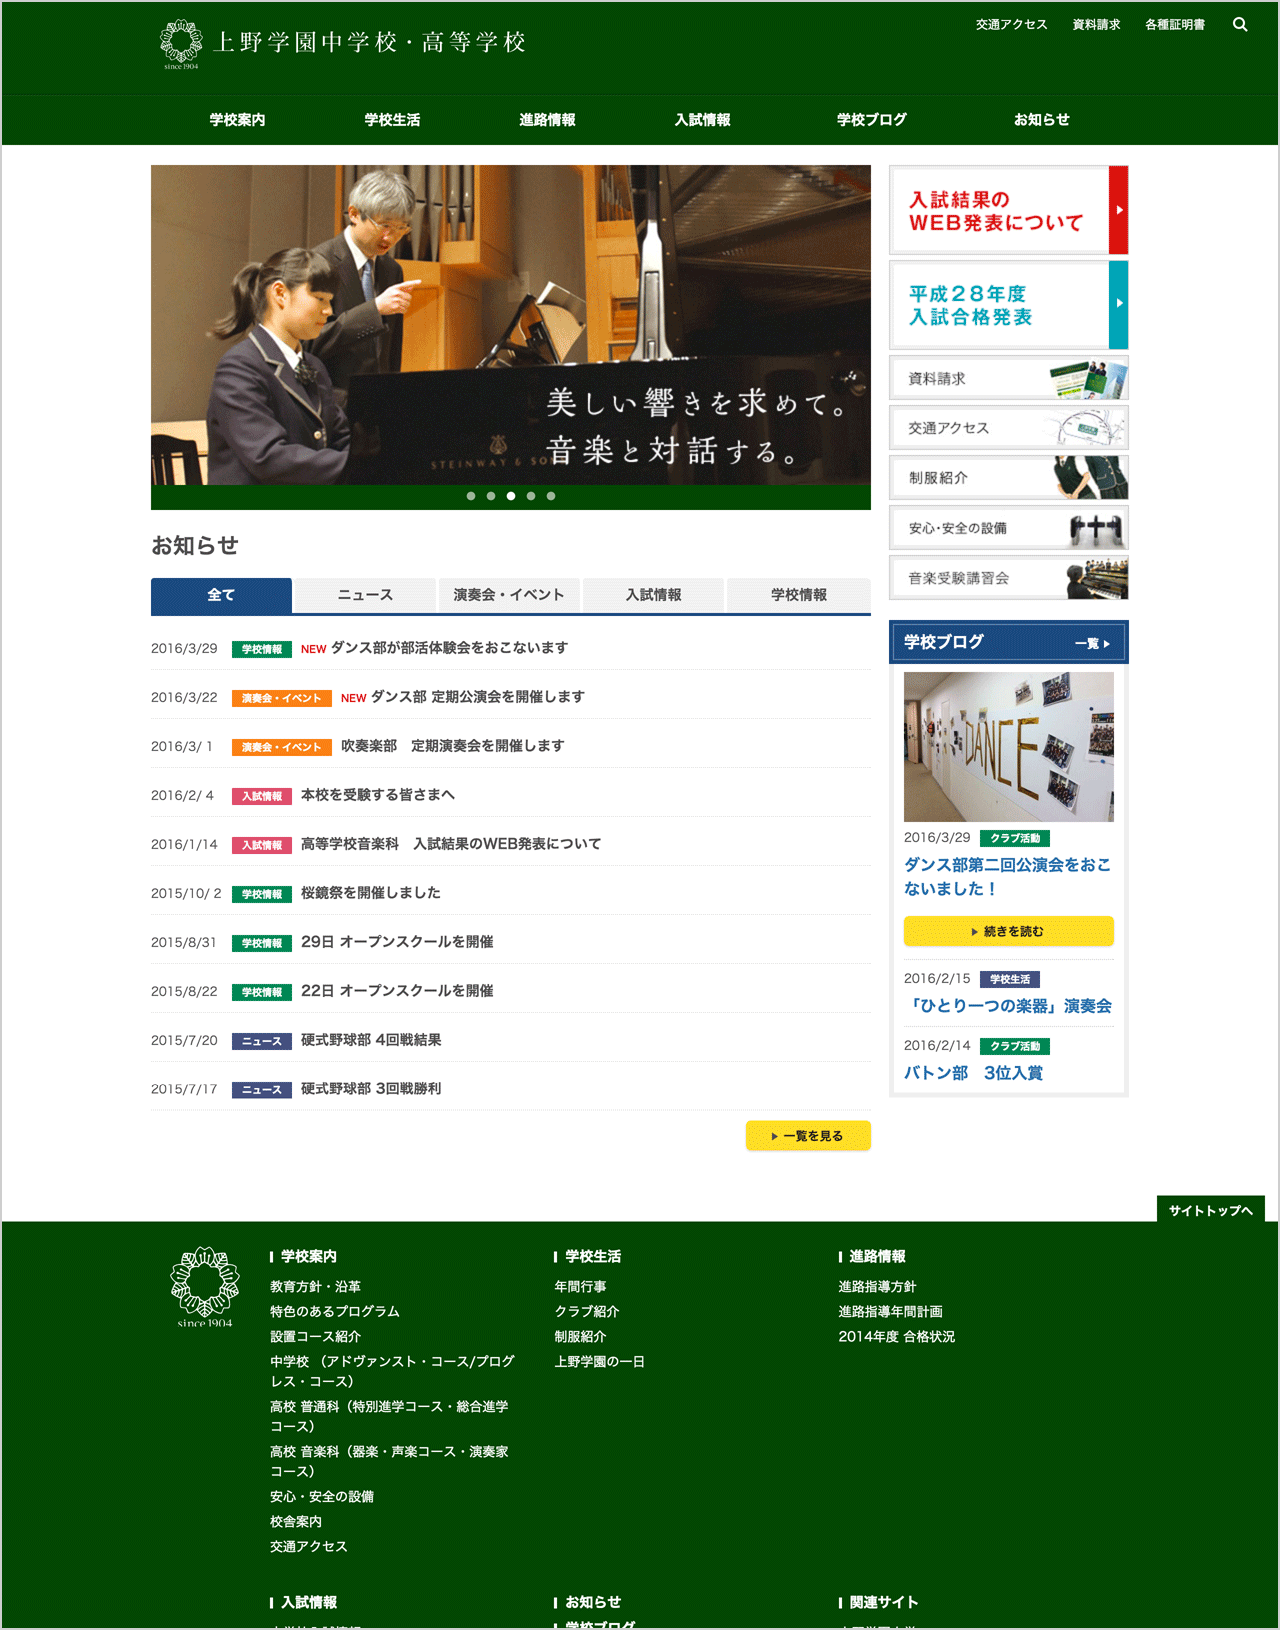 ap_web_ueno-gakuen-chugaku_2015_pc.png